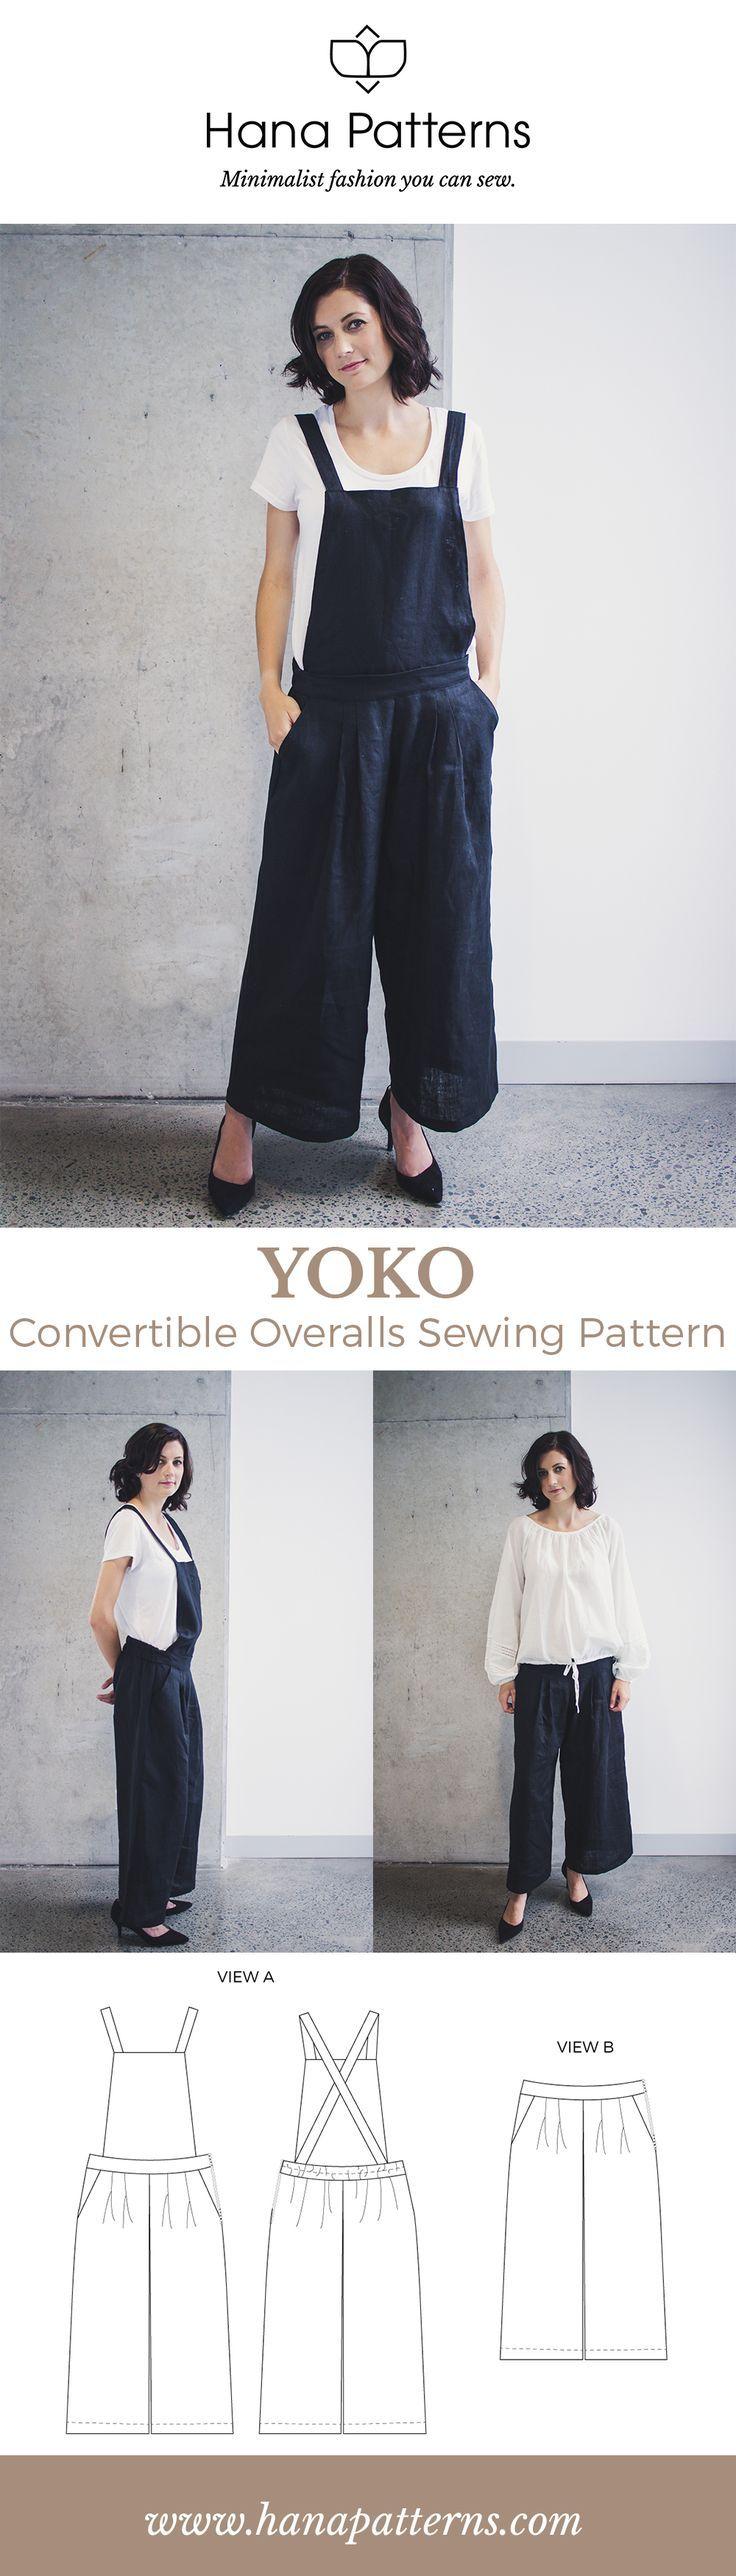 Yoko Convertible Overalls Pants Sewing Pattern | Freizeithosen ...